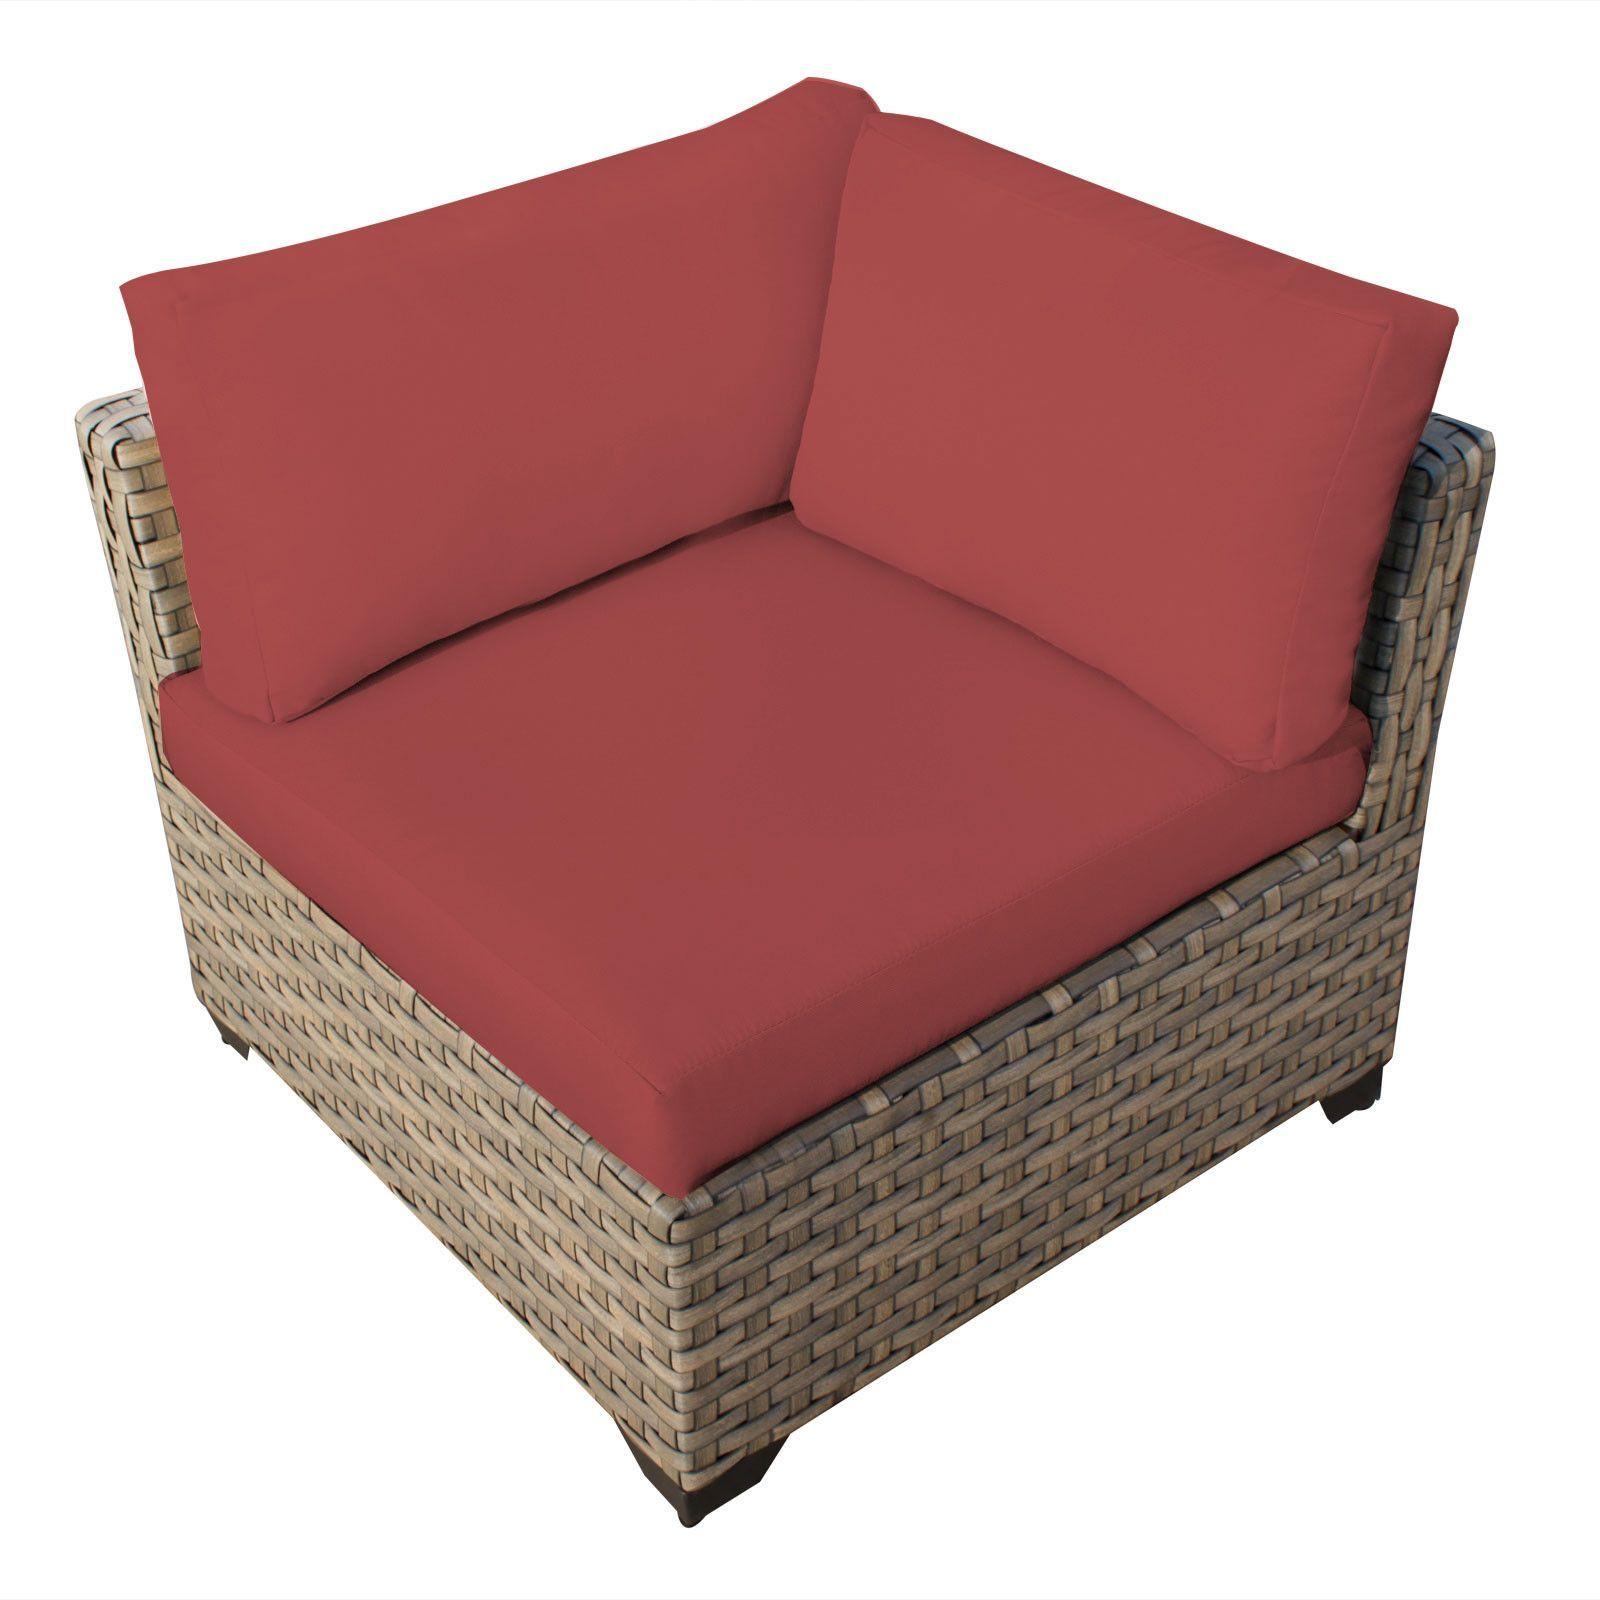 Tkc Monterey Corner Outdoor Patio Sofa Set Terracotta